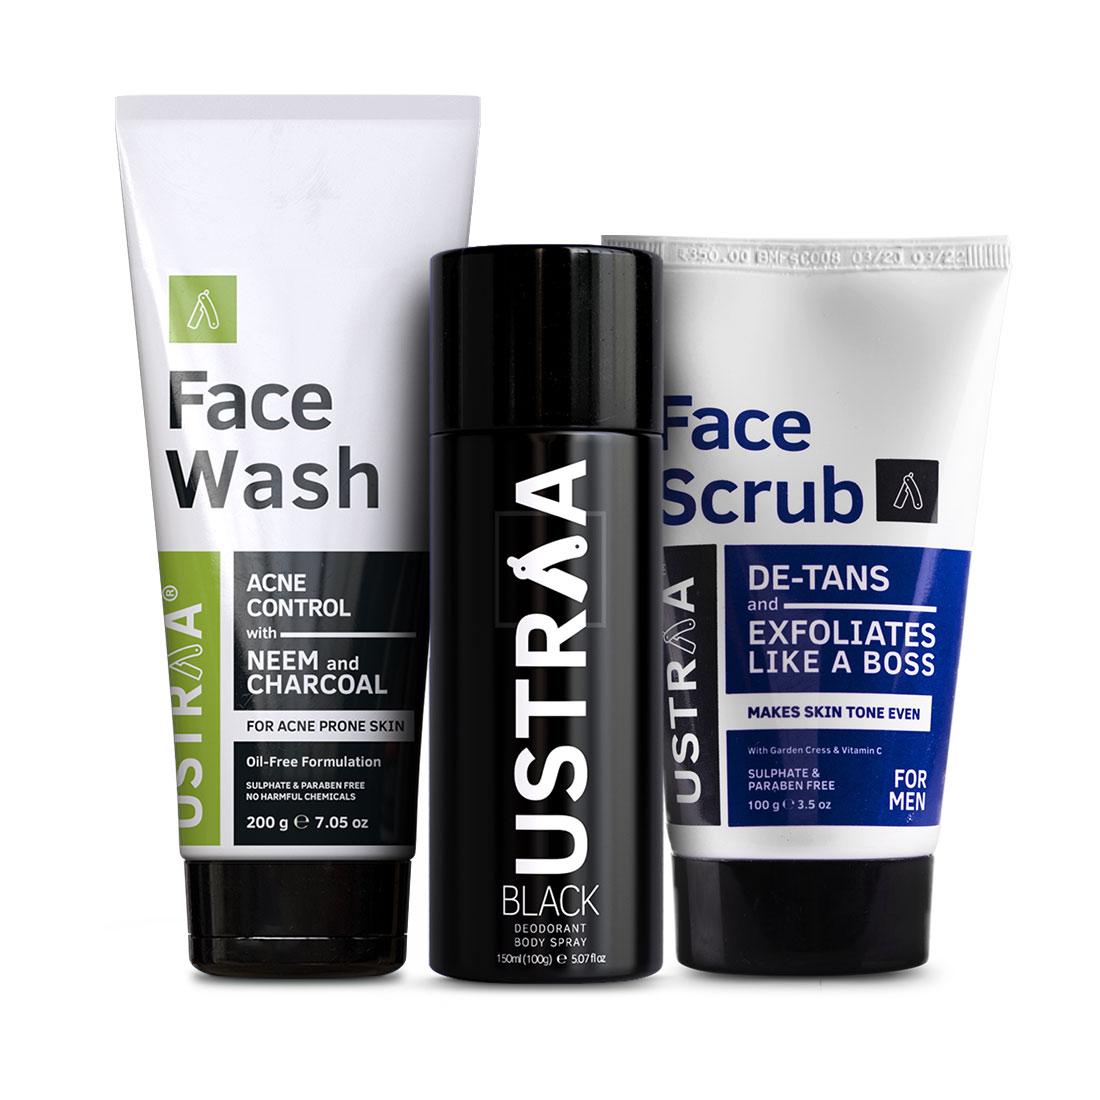 Ustraa | Ustraa Black Deodorant 150ml, De-tan Face Scrub 100g & Face Wash Neem and Charcoal 200g